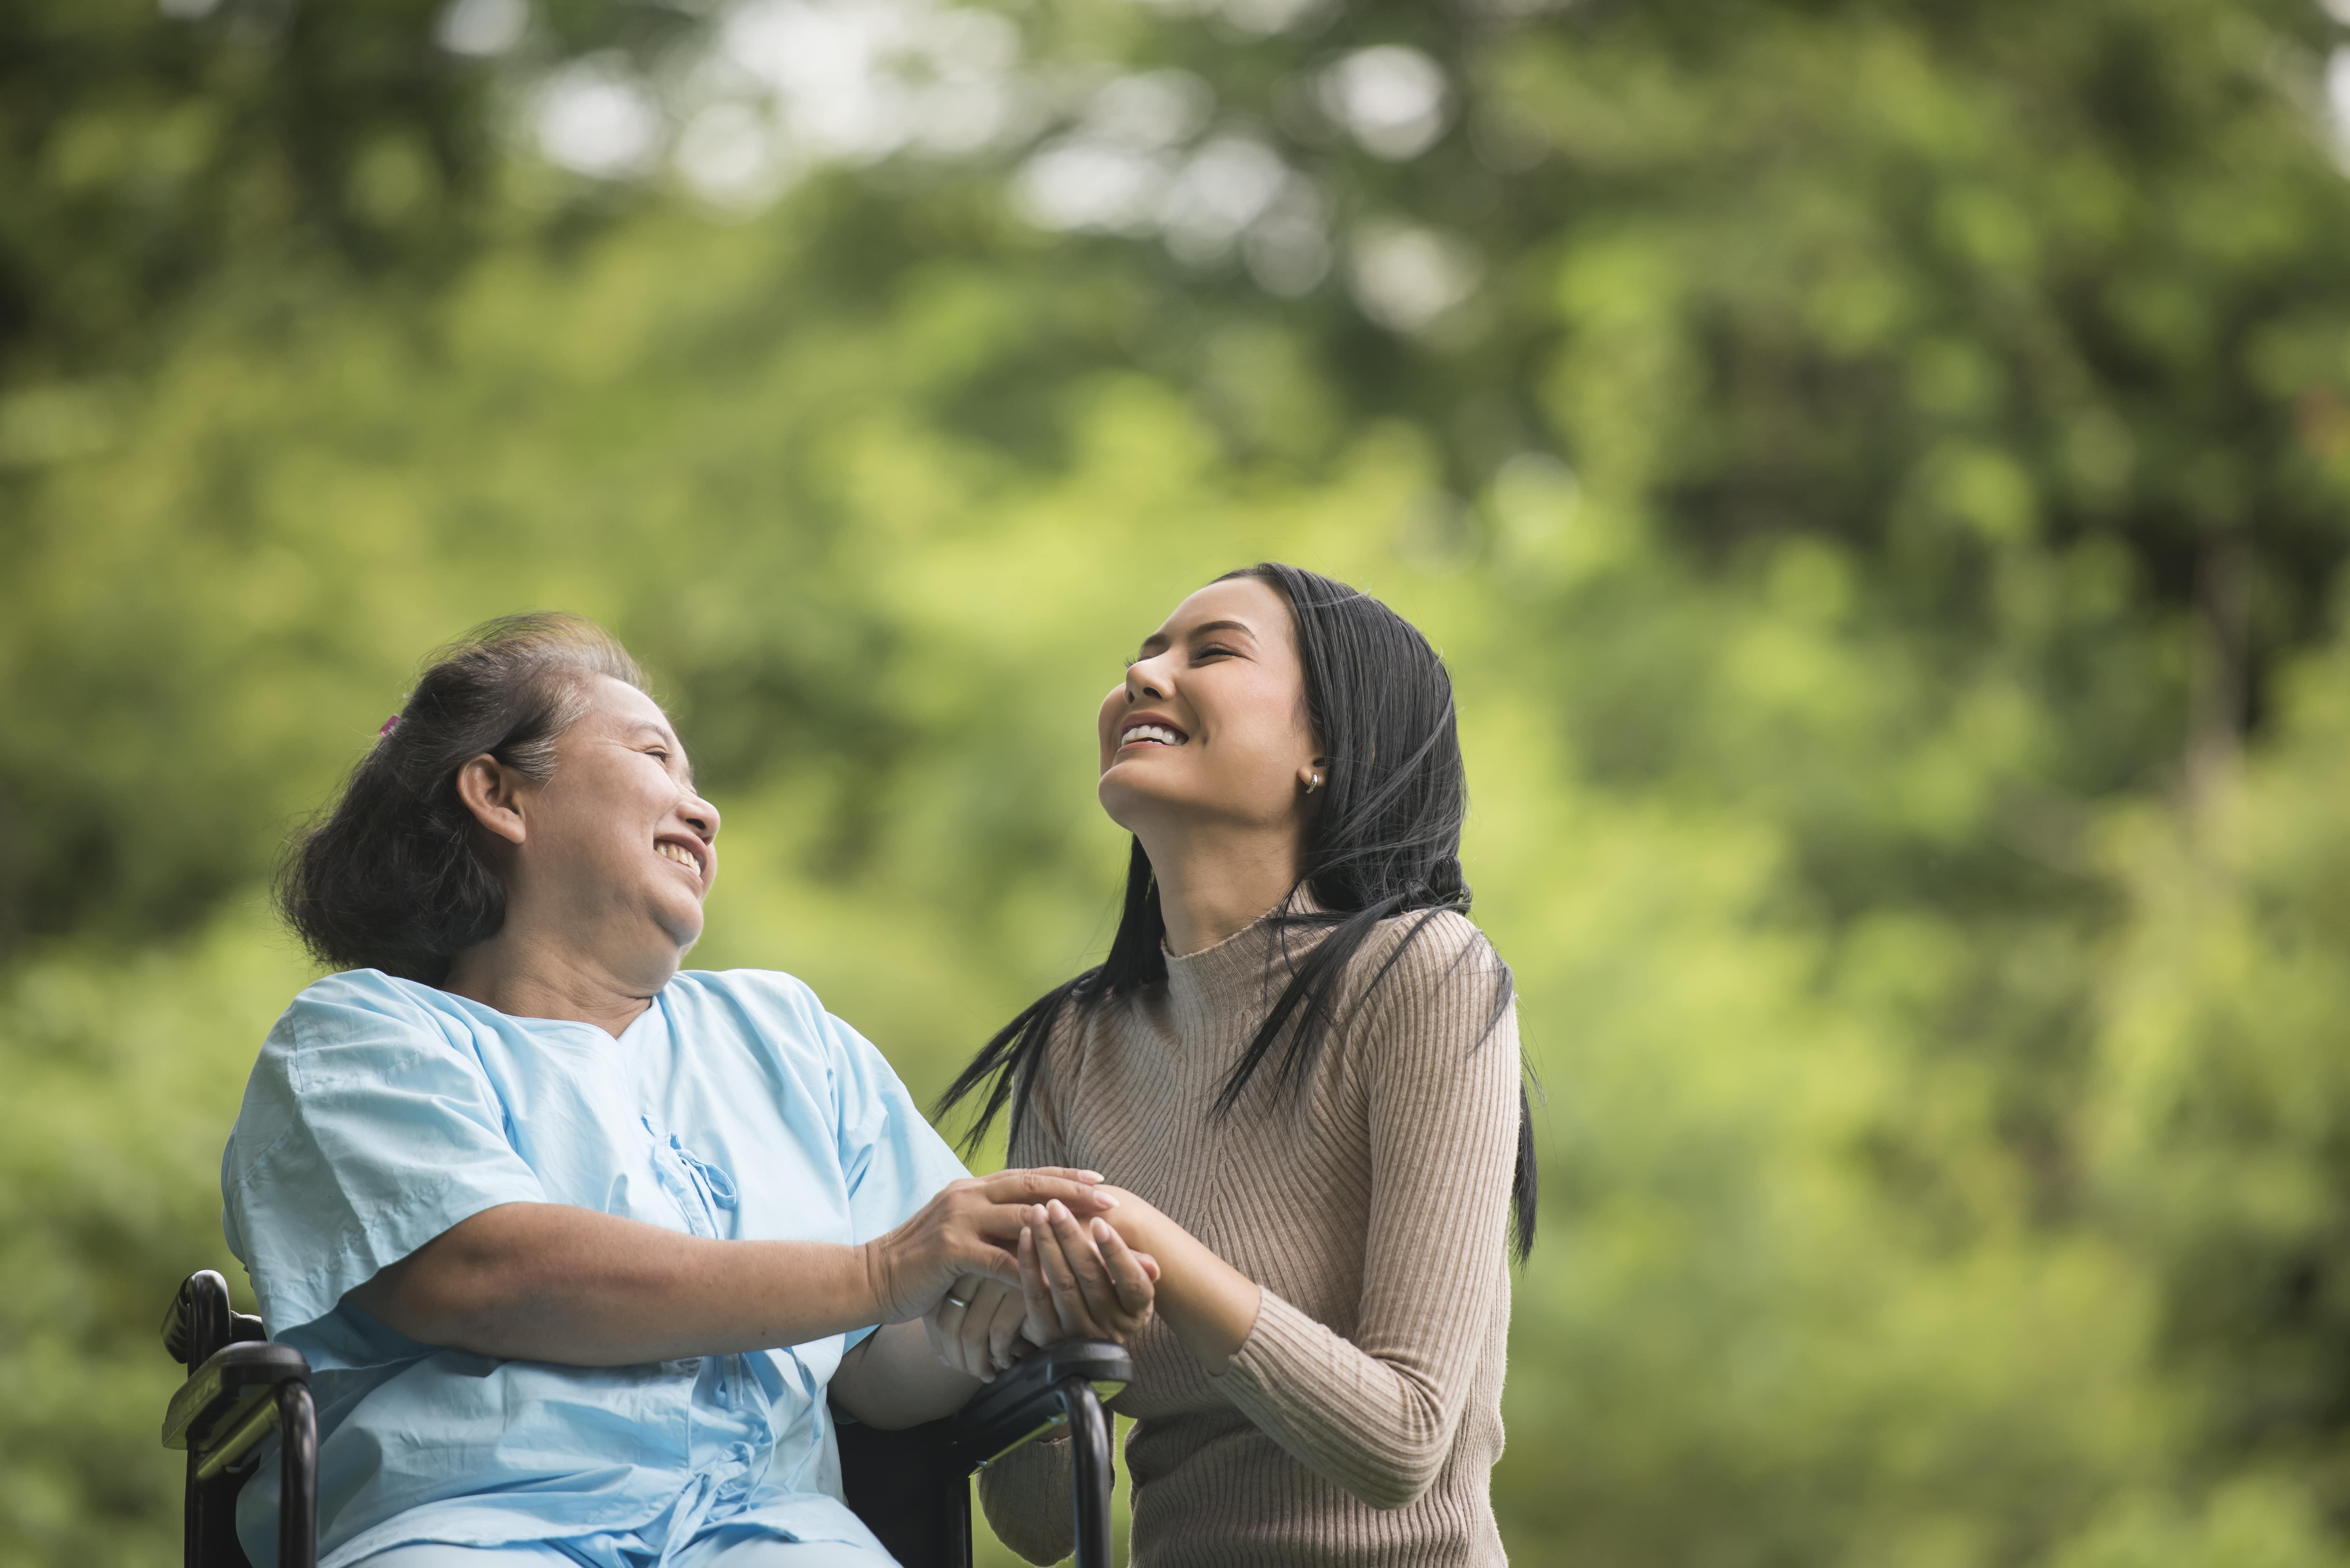 5 Chronic Diseases Women Should Be Aware Of